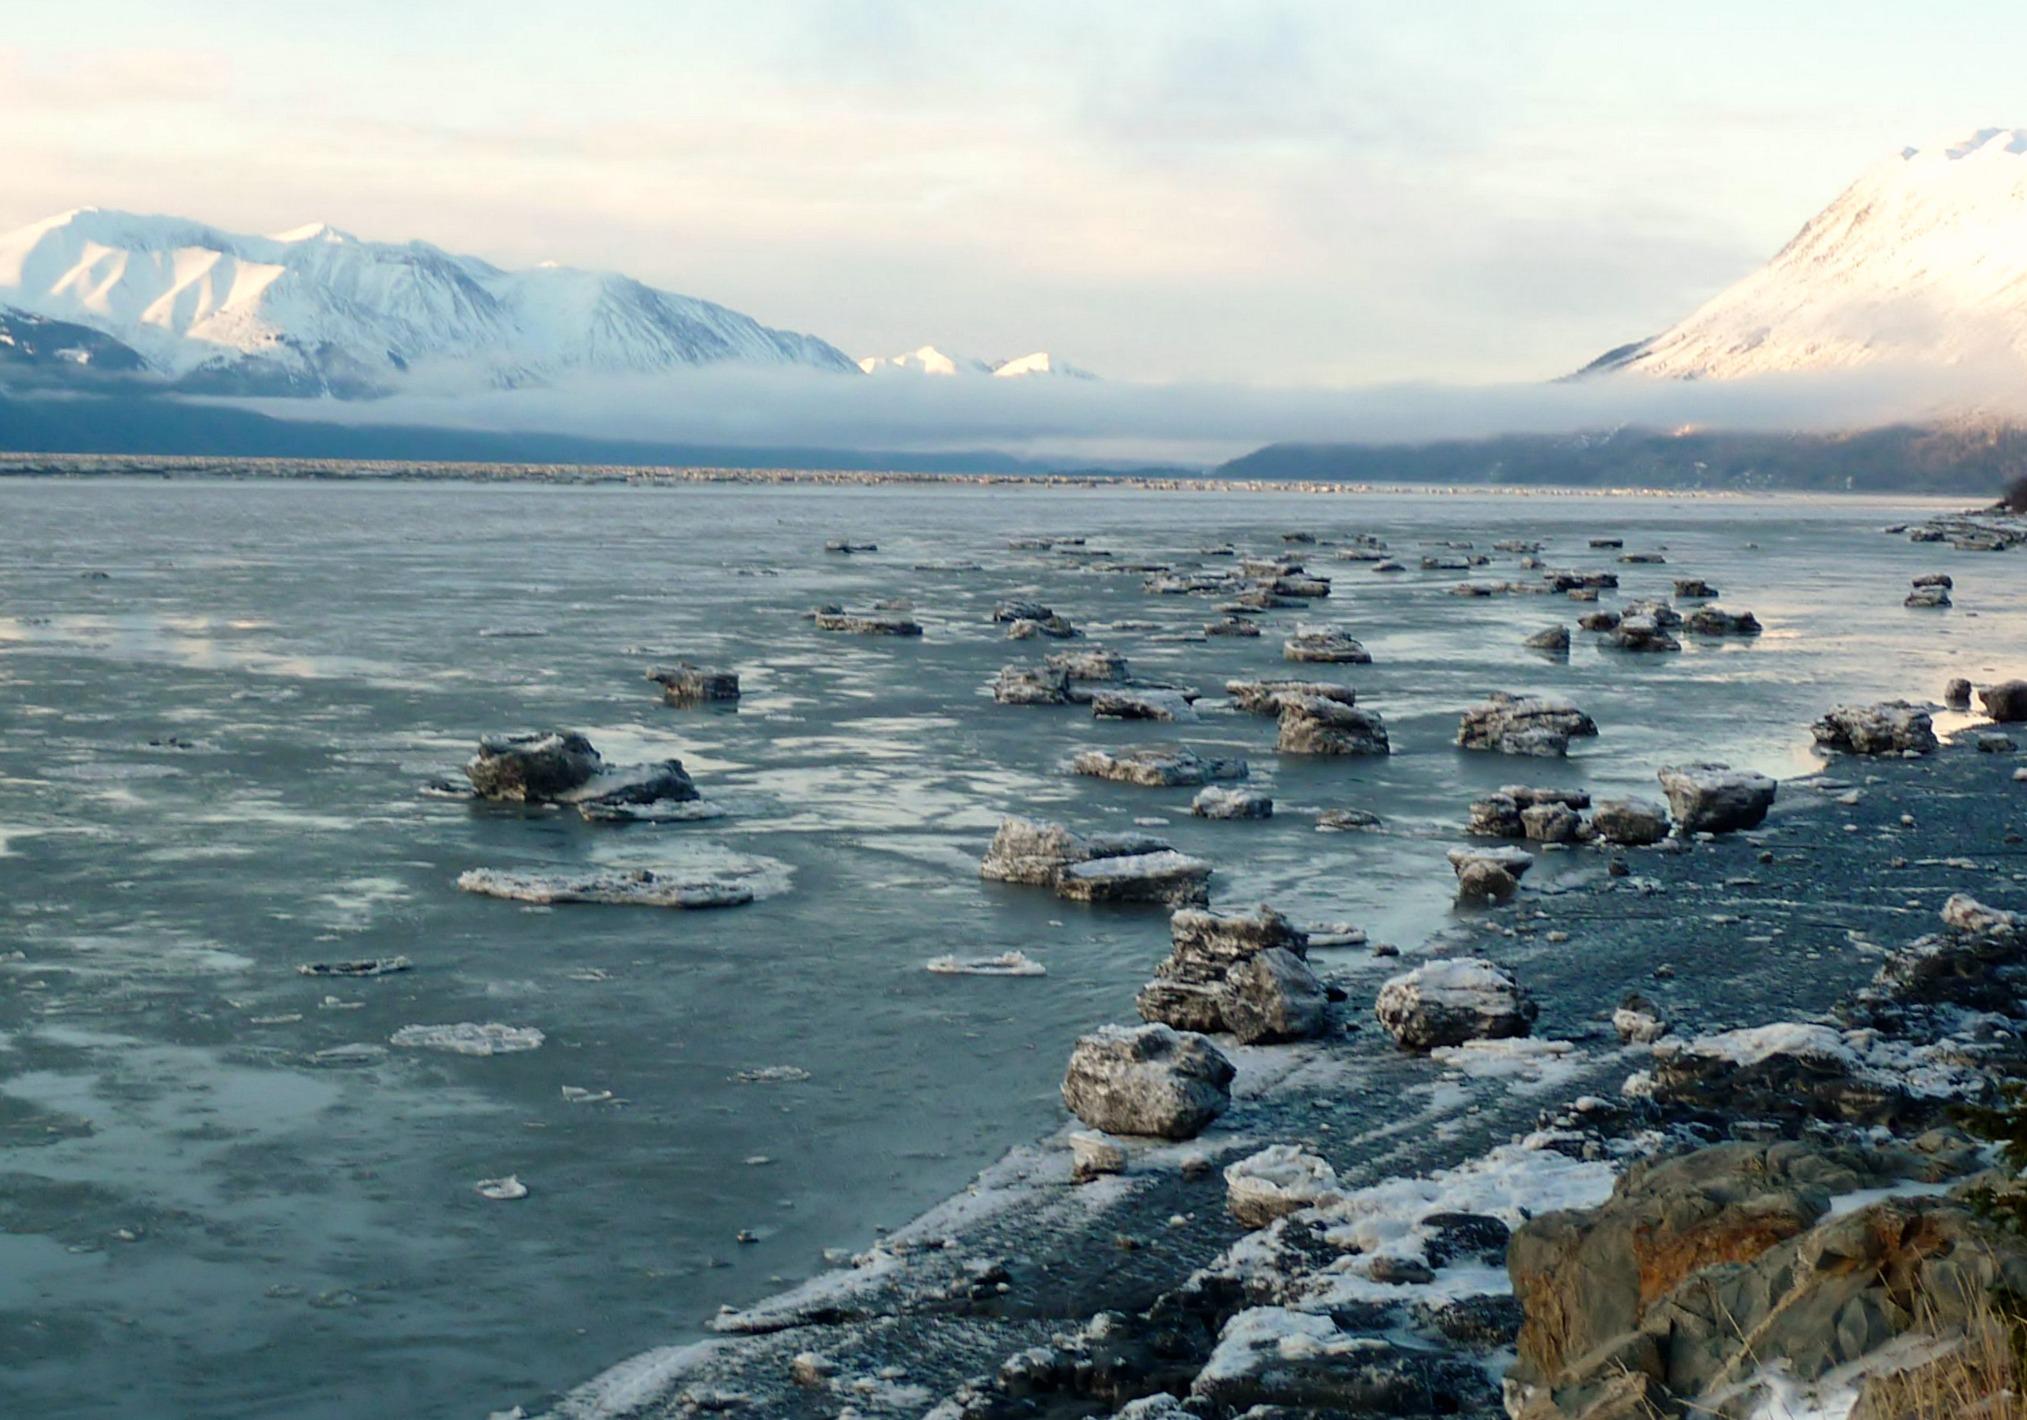 Alaska Mountain View - The Exploress